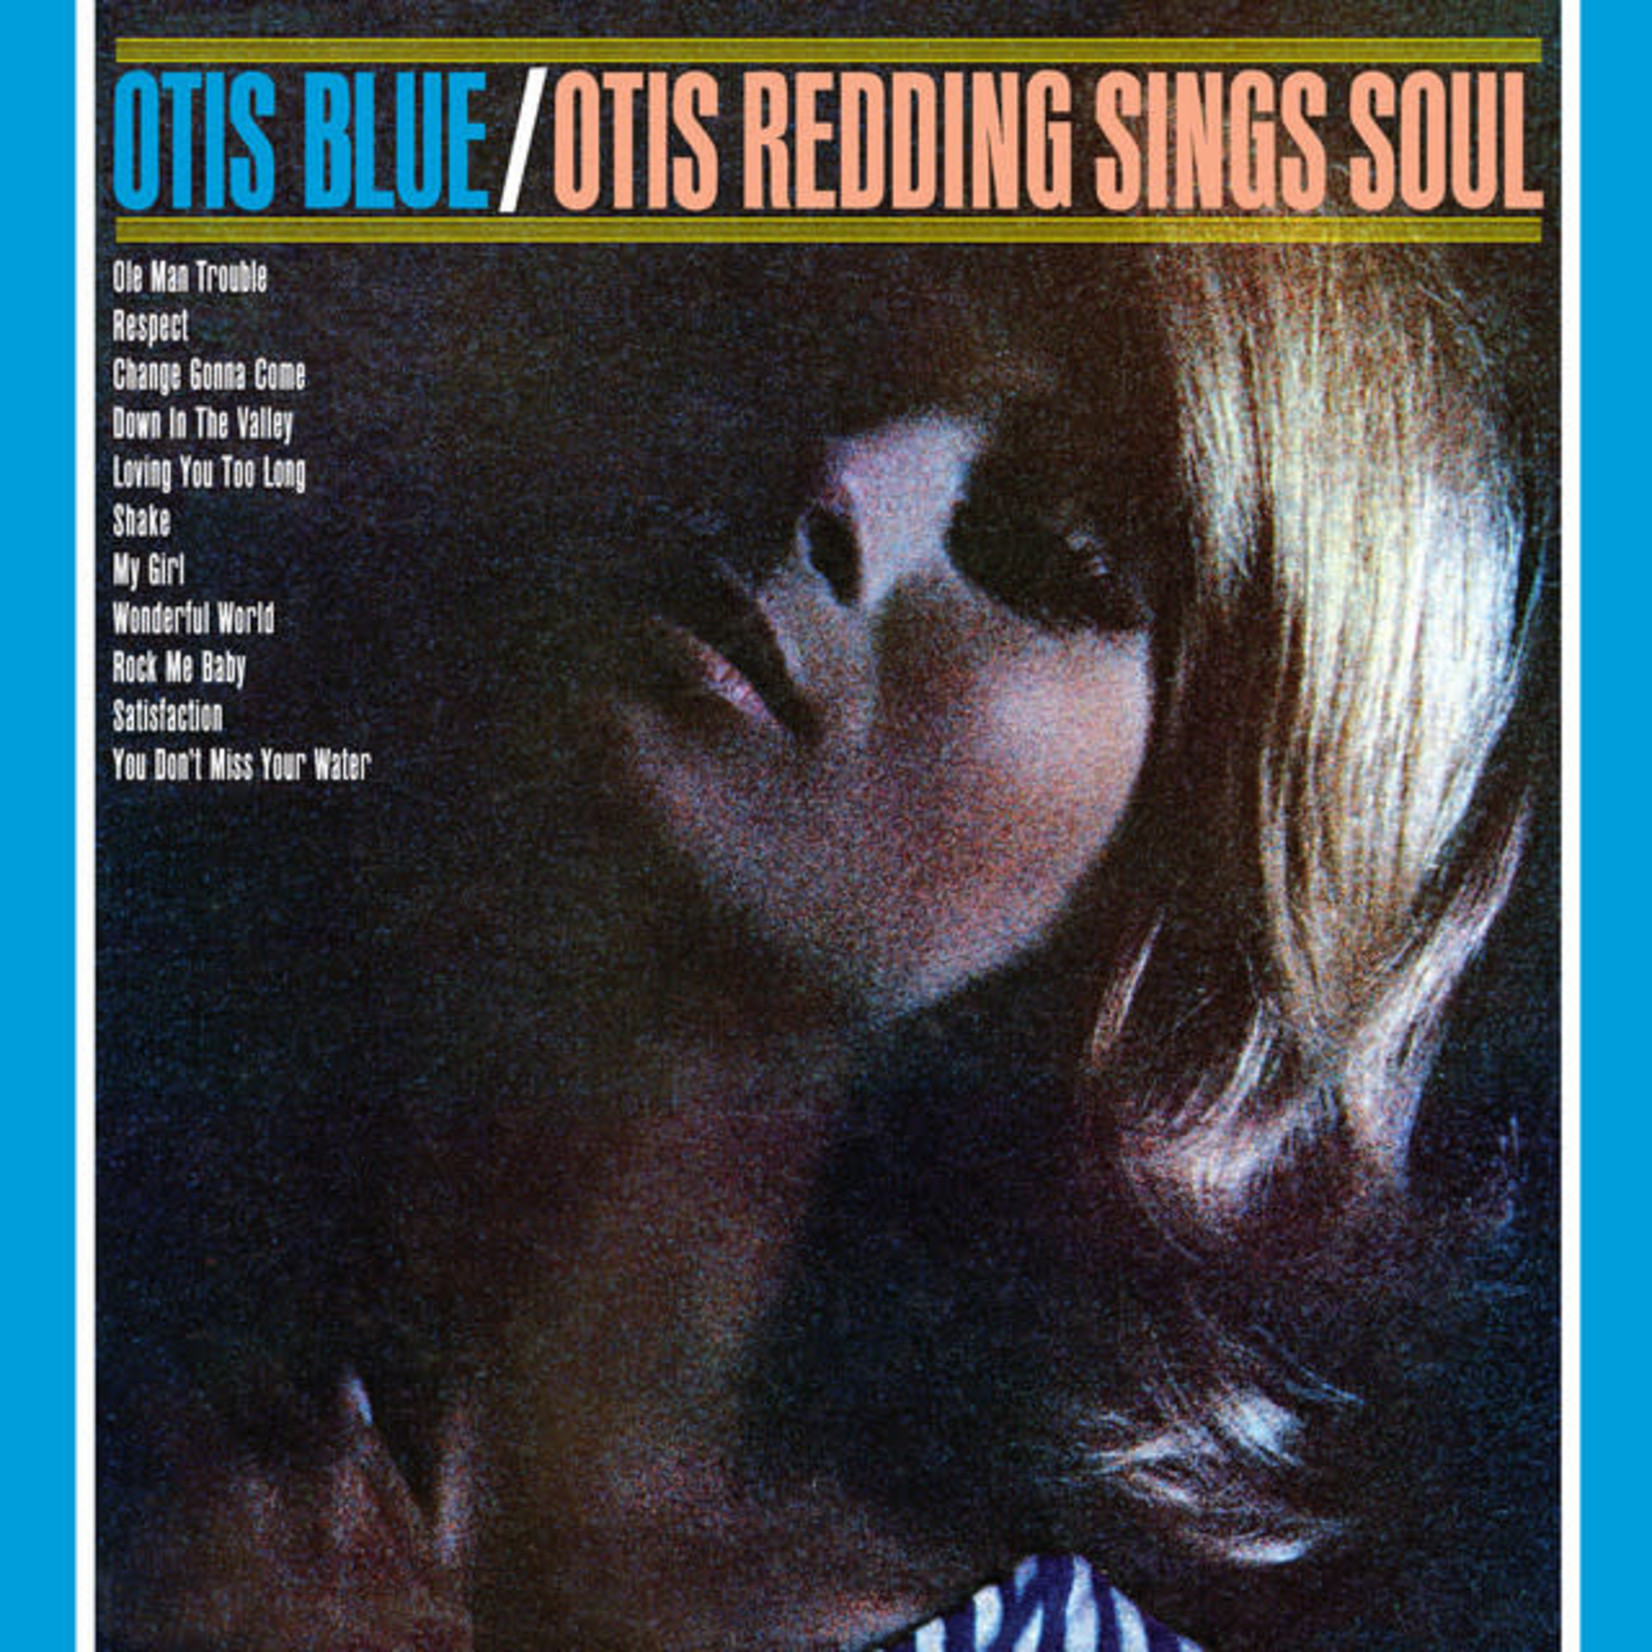 Compact Disc Otis Redding - Otis Blue  SACD